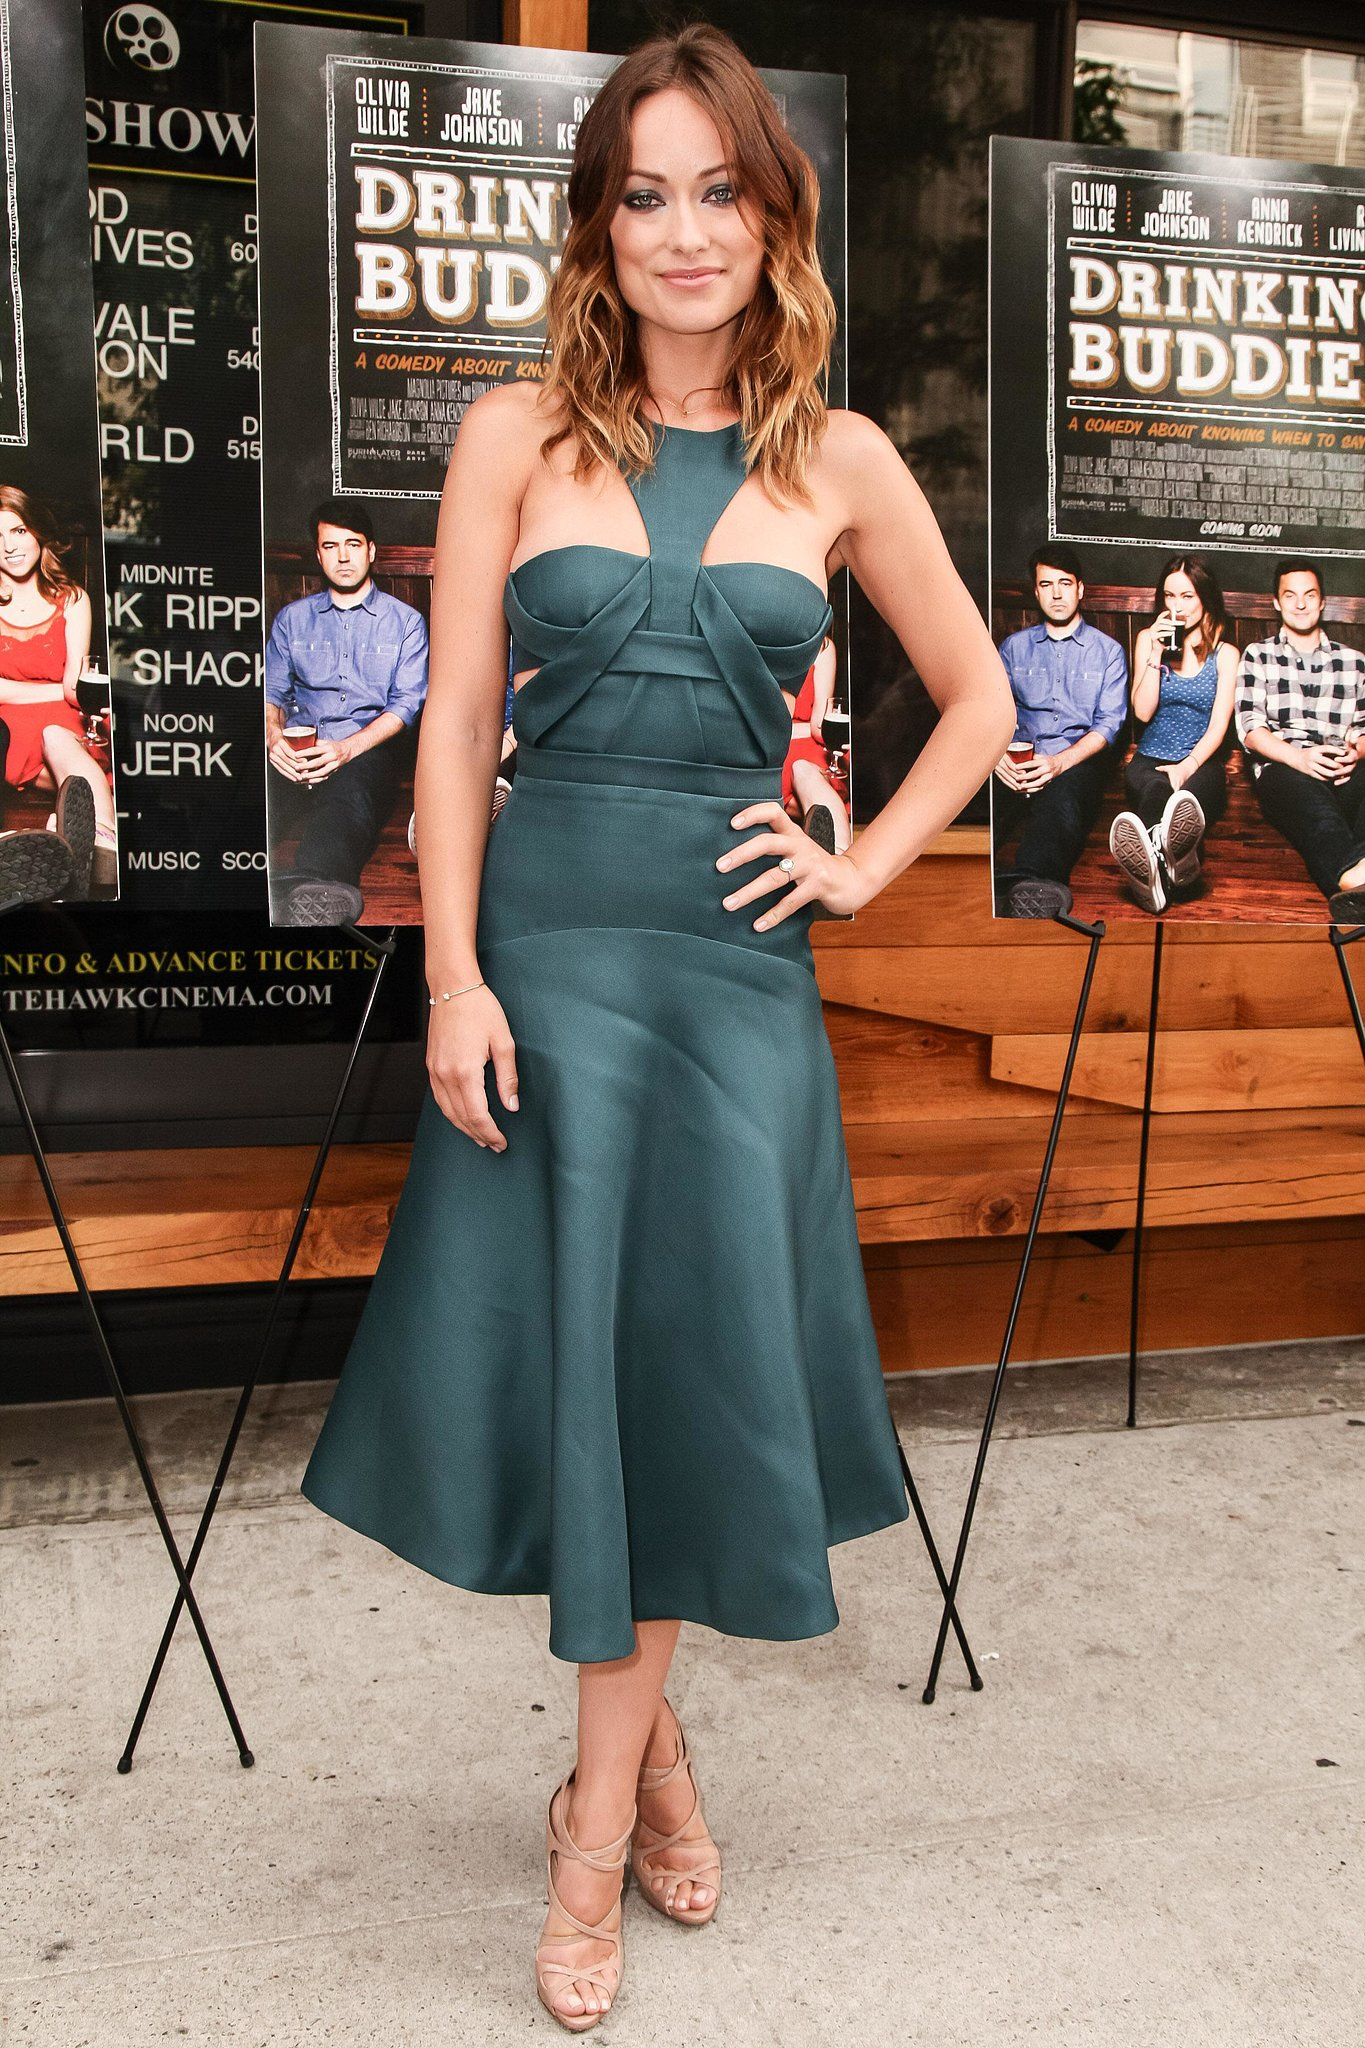 Olivia Wilde screened Drinking Buddies in a modern J. Mendel dress in Brooklyn.